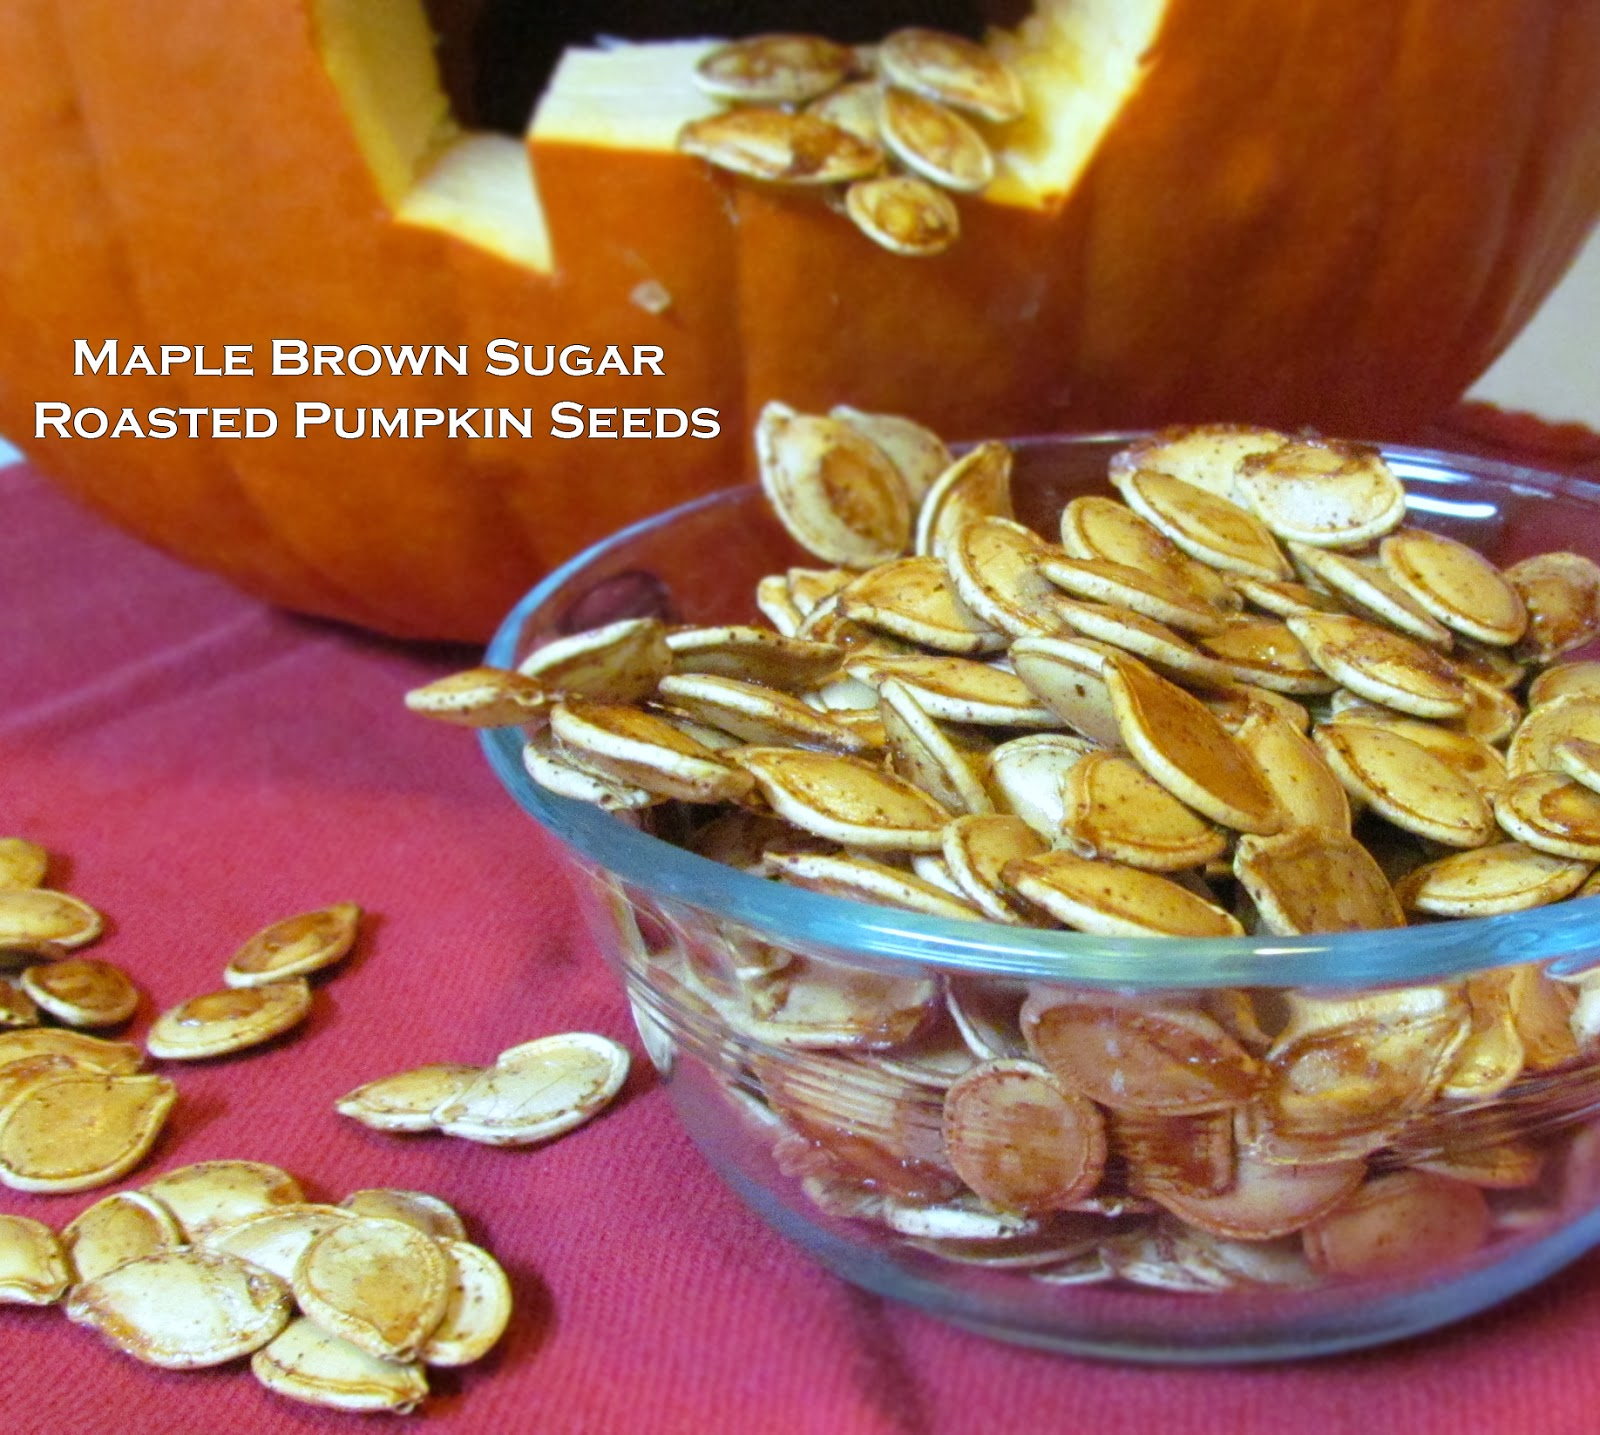 Getting stuffed maple brown sugar roasted pumpkin seeds